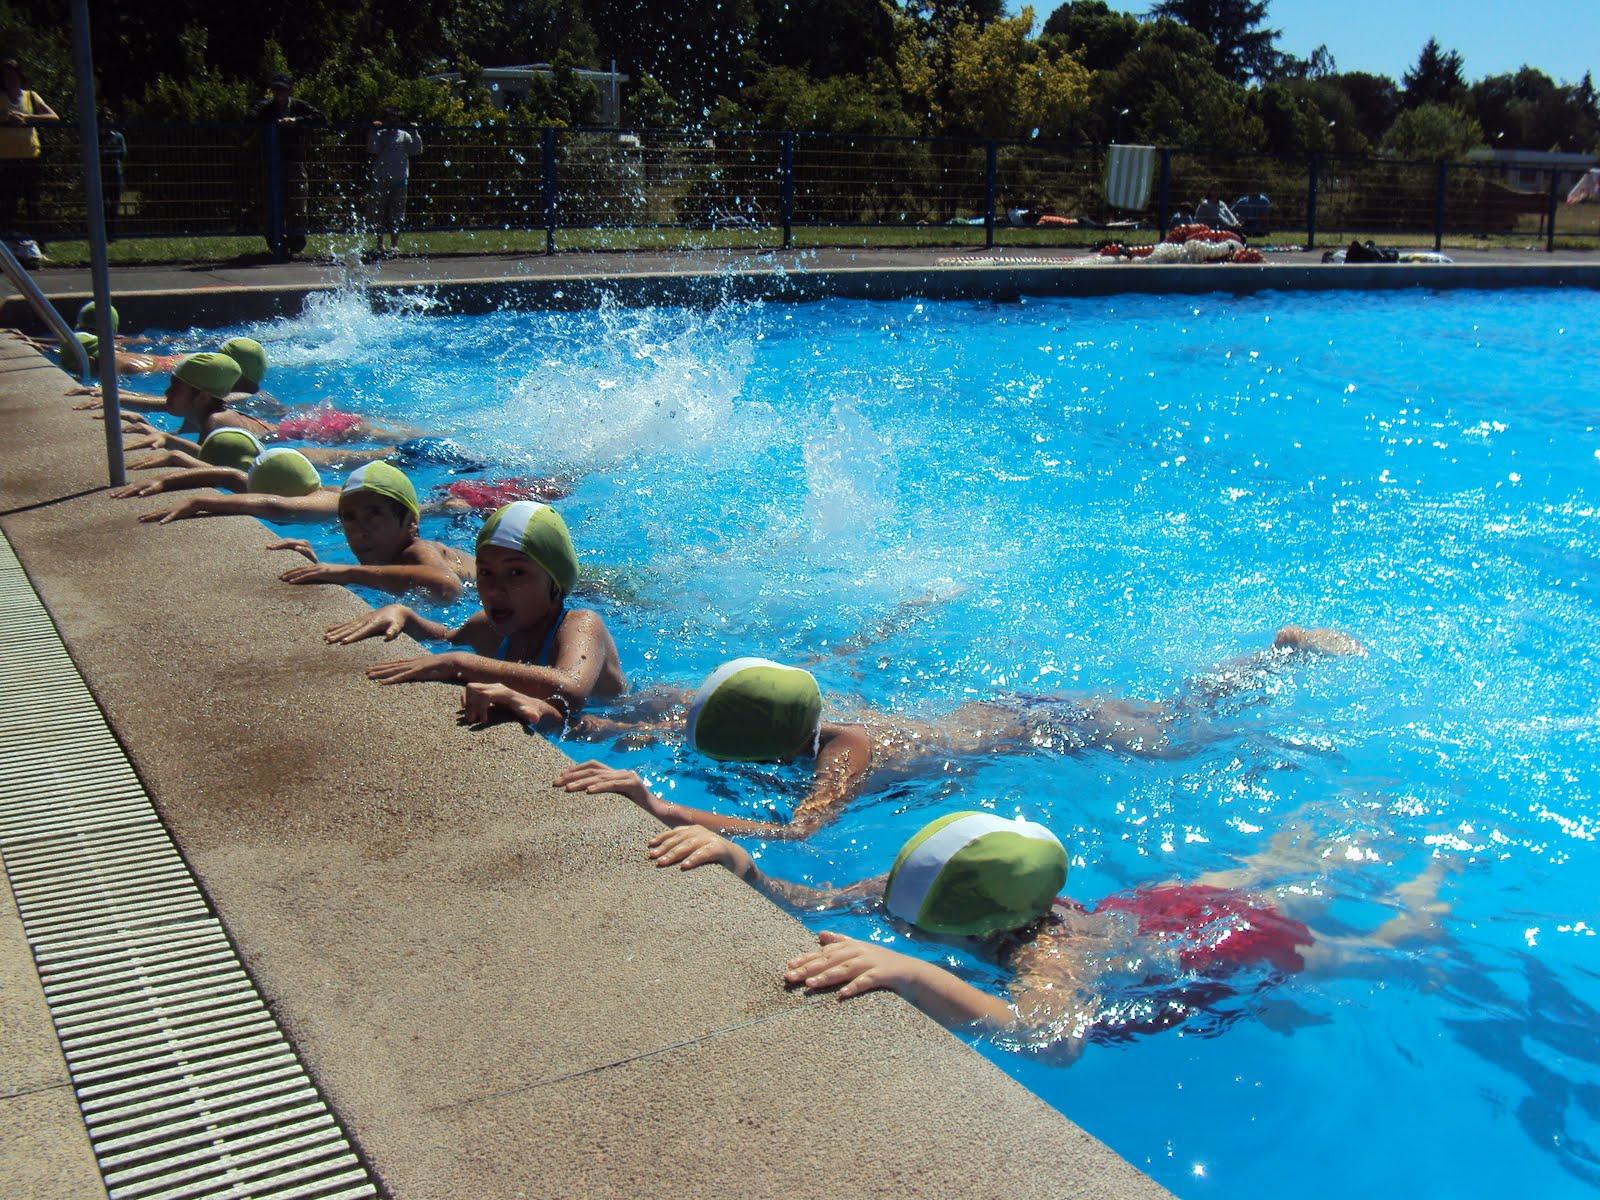 Solo ideas abril 2011 for En la piscina